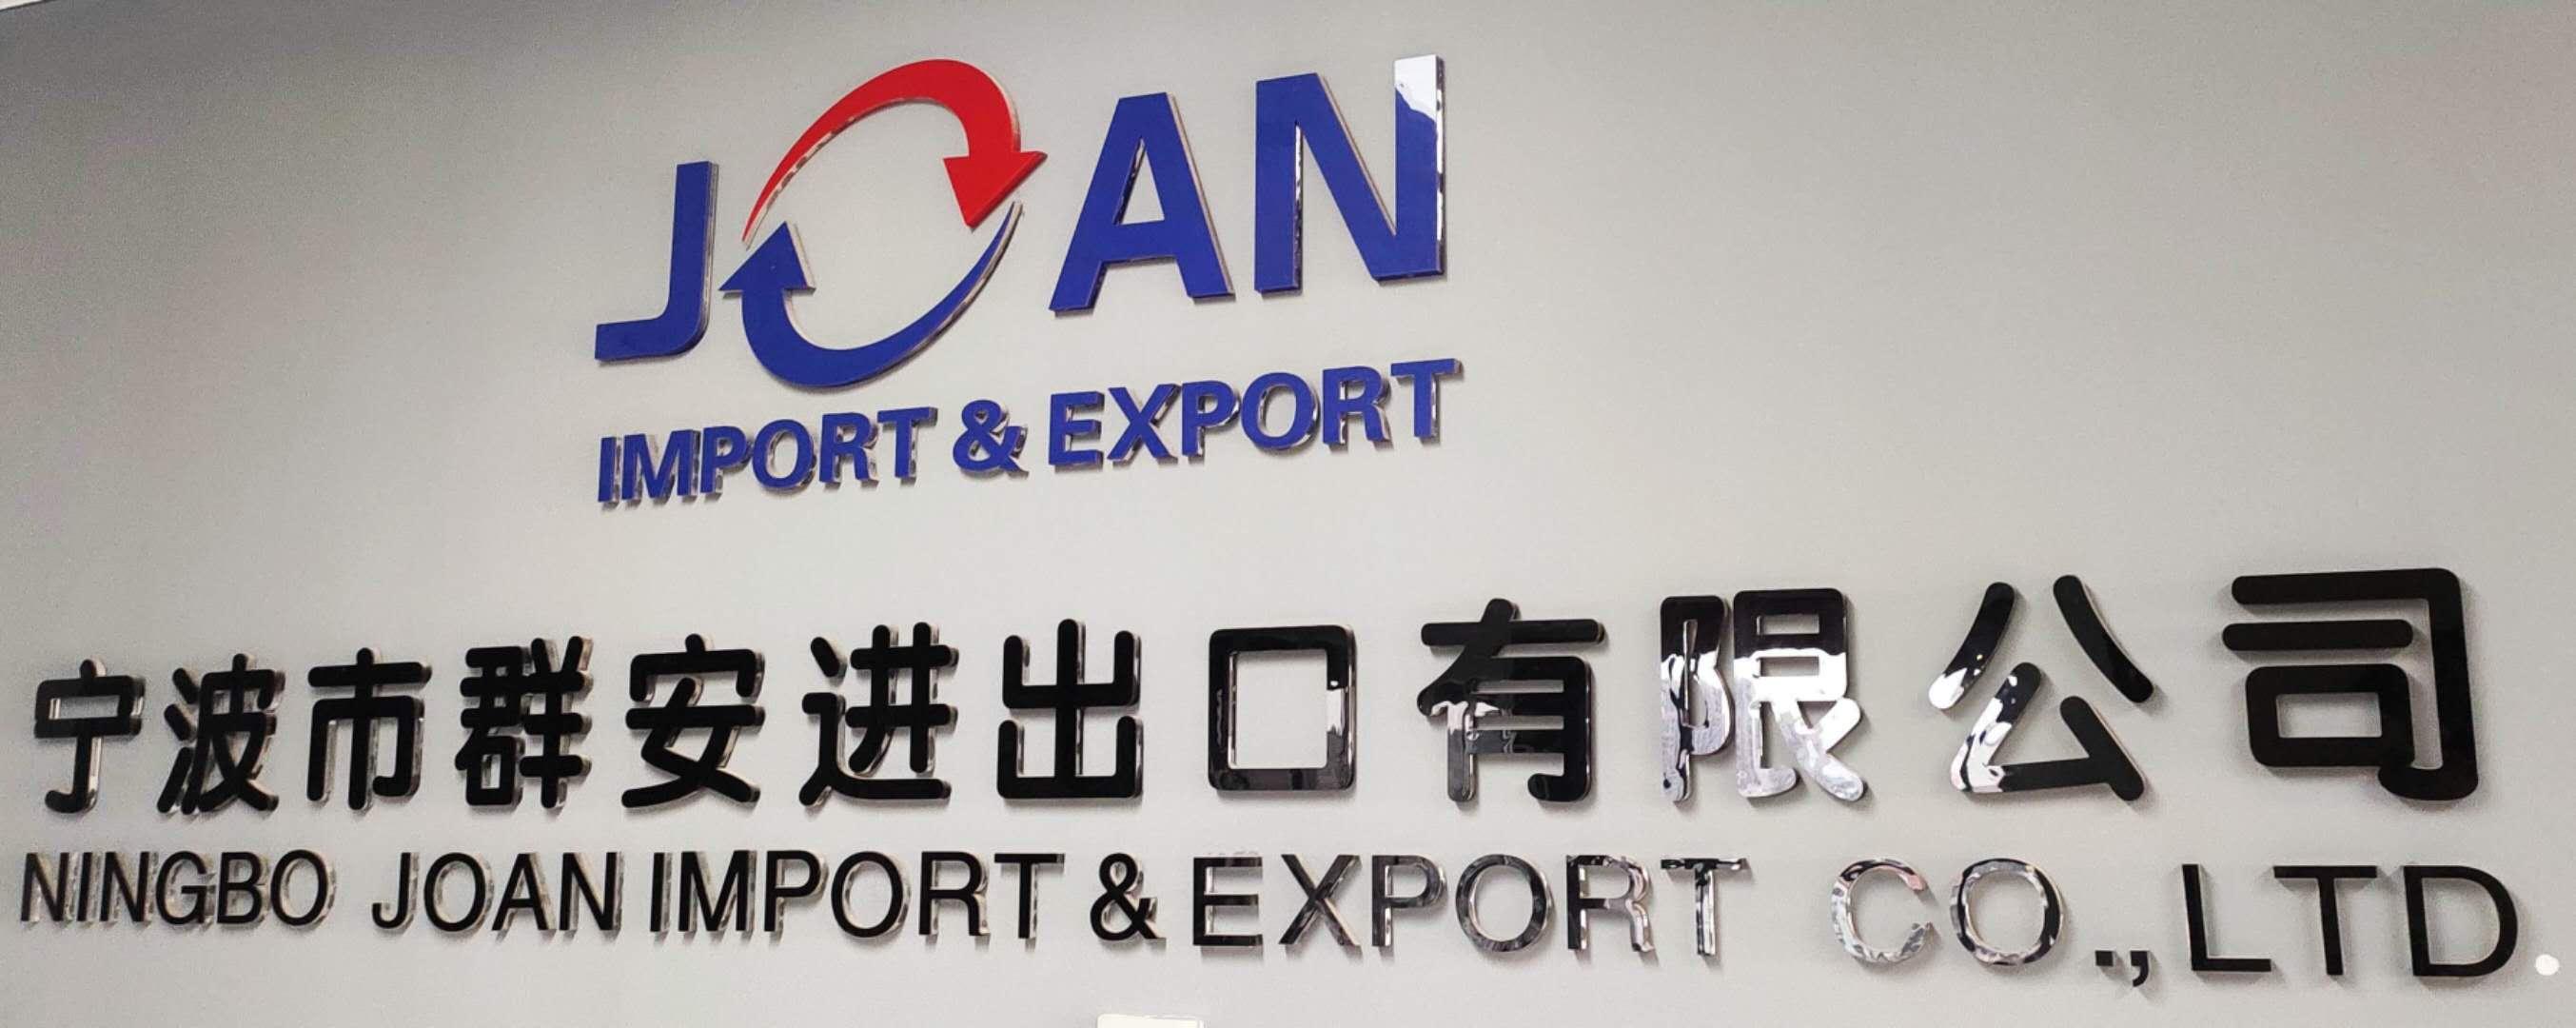 NINGBO JOAN IMPORT&EXPORT CO.,LTD.